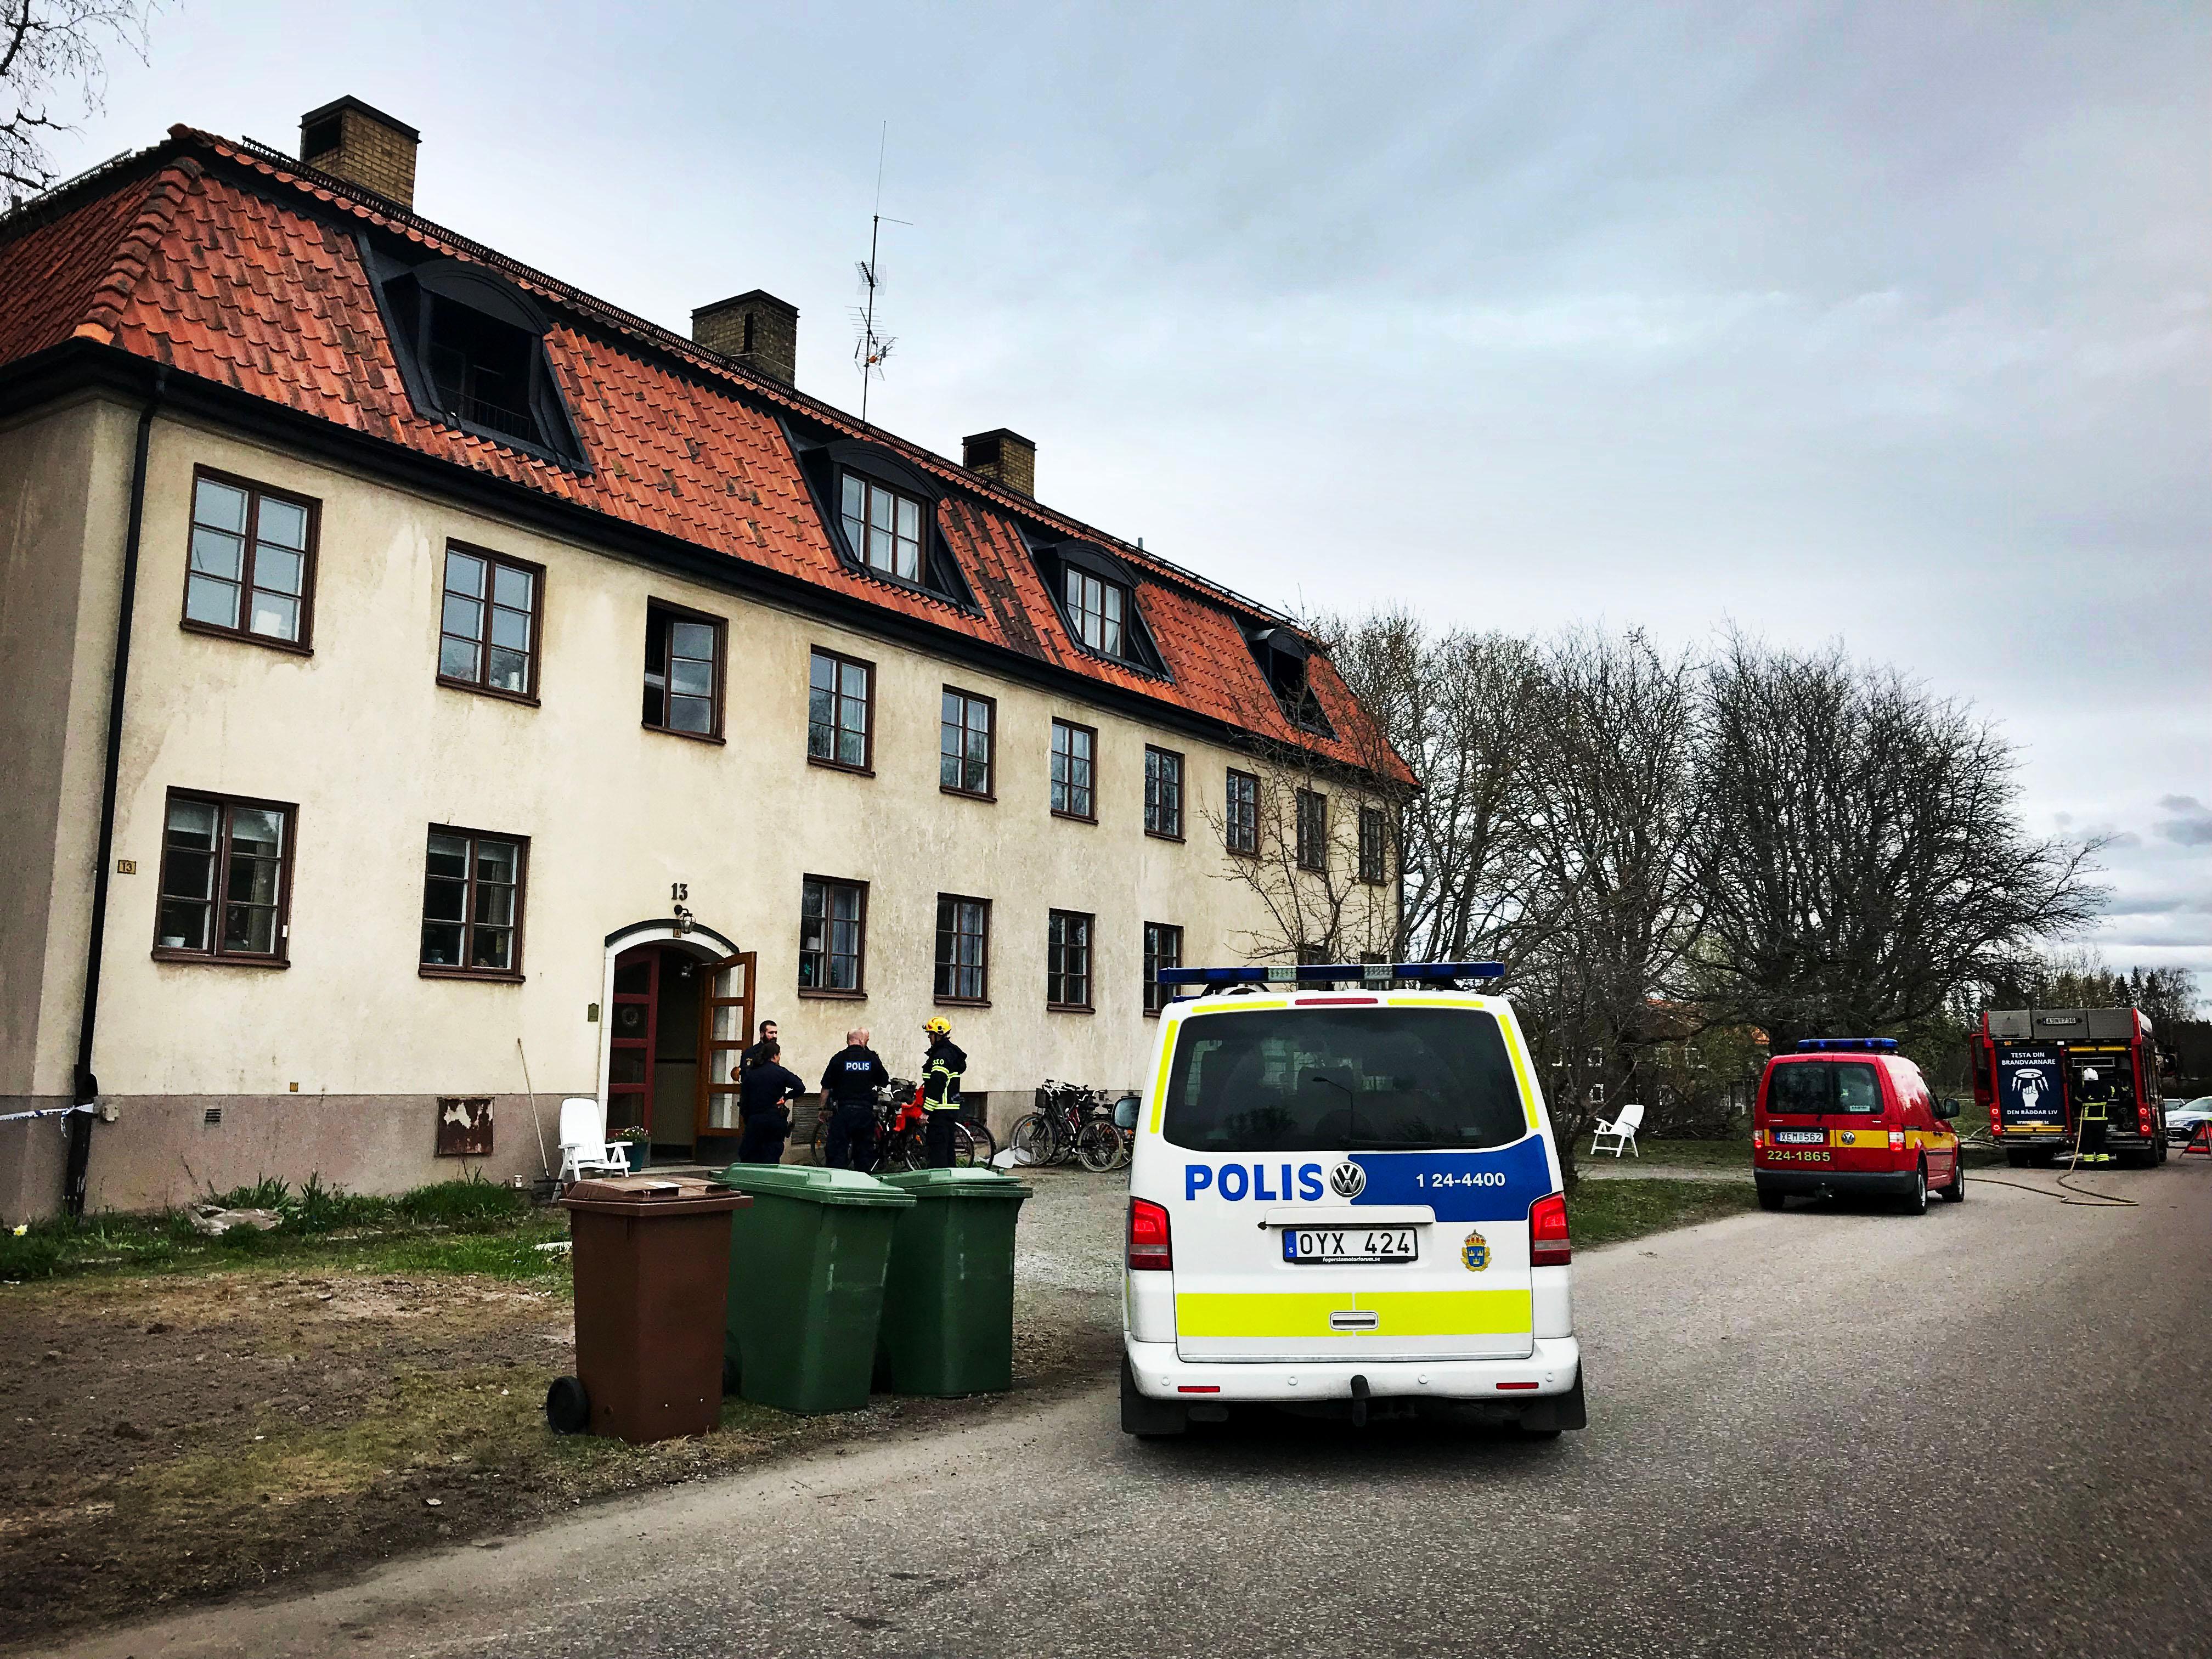 Polisskott i jakt pa misstankta mordbrannare vid skola